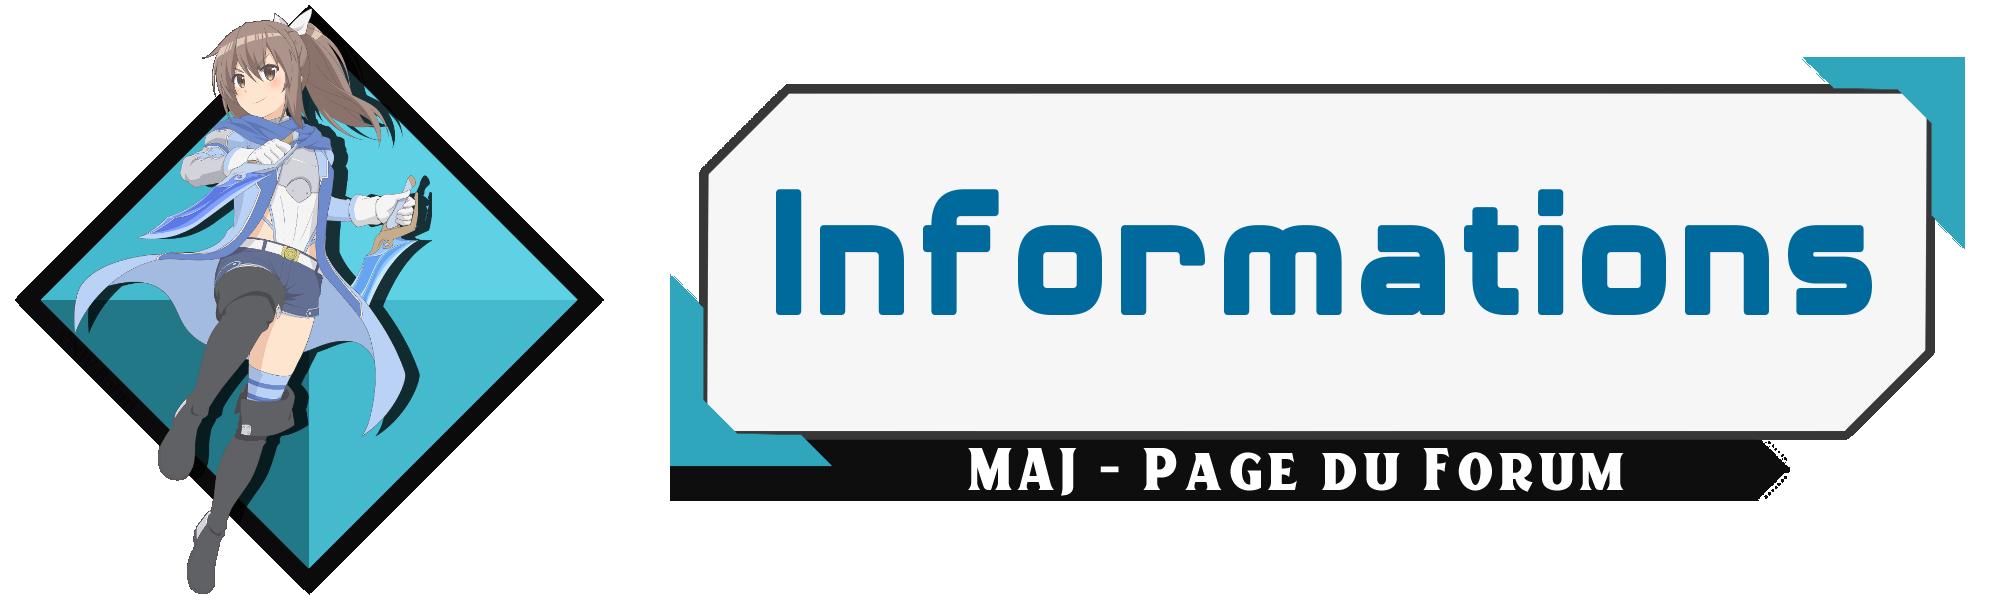 Informations Header.png